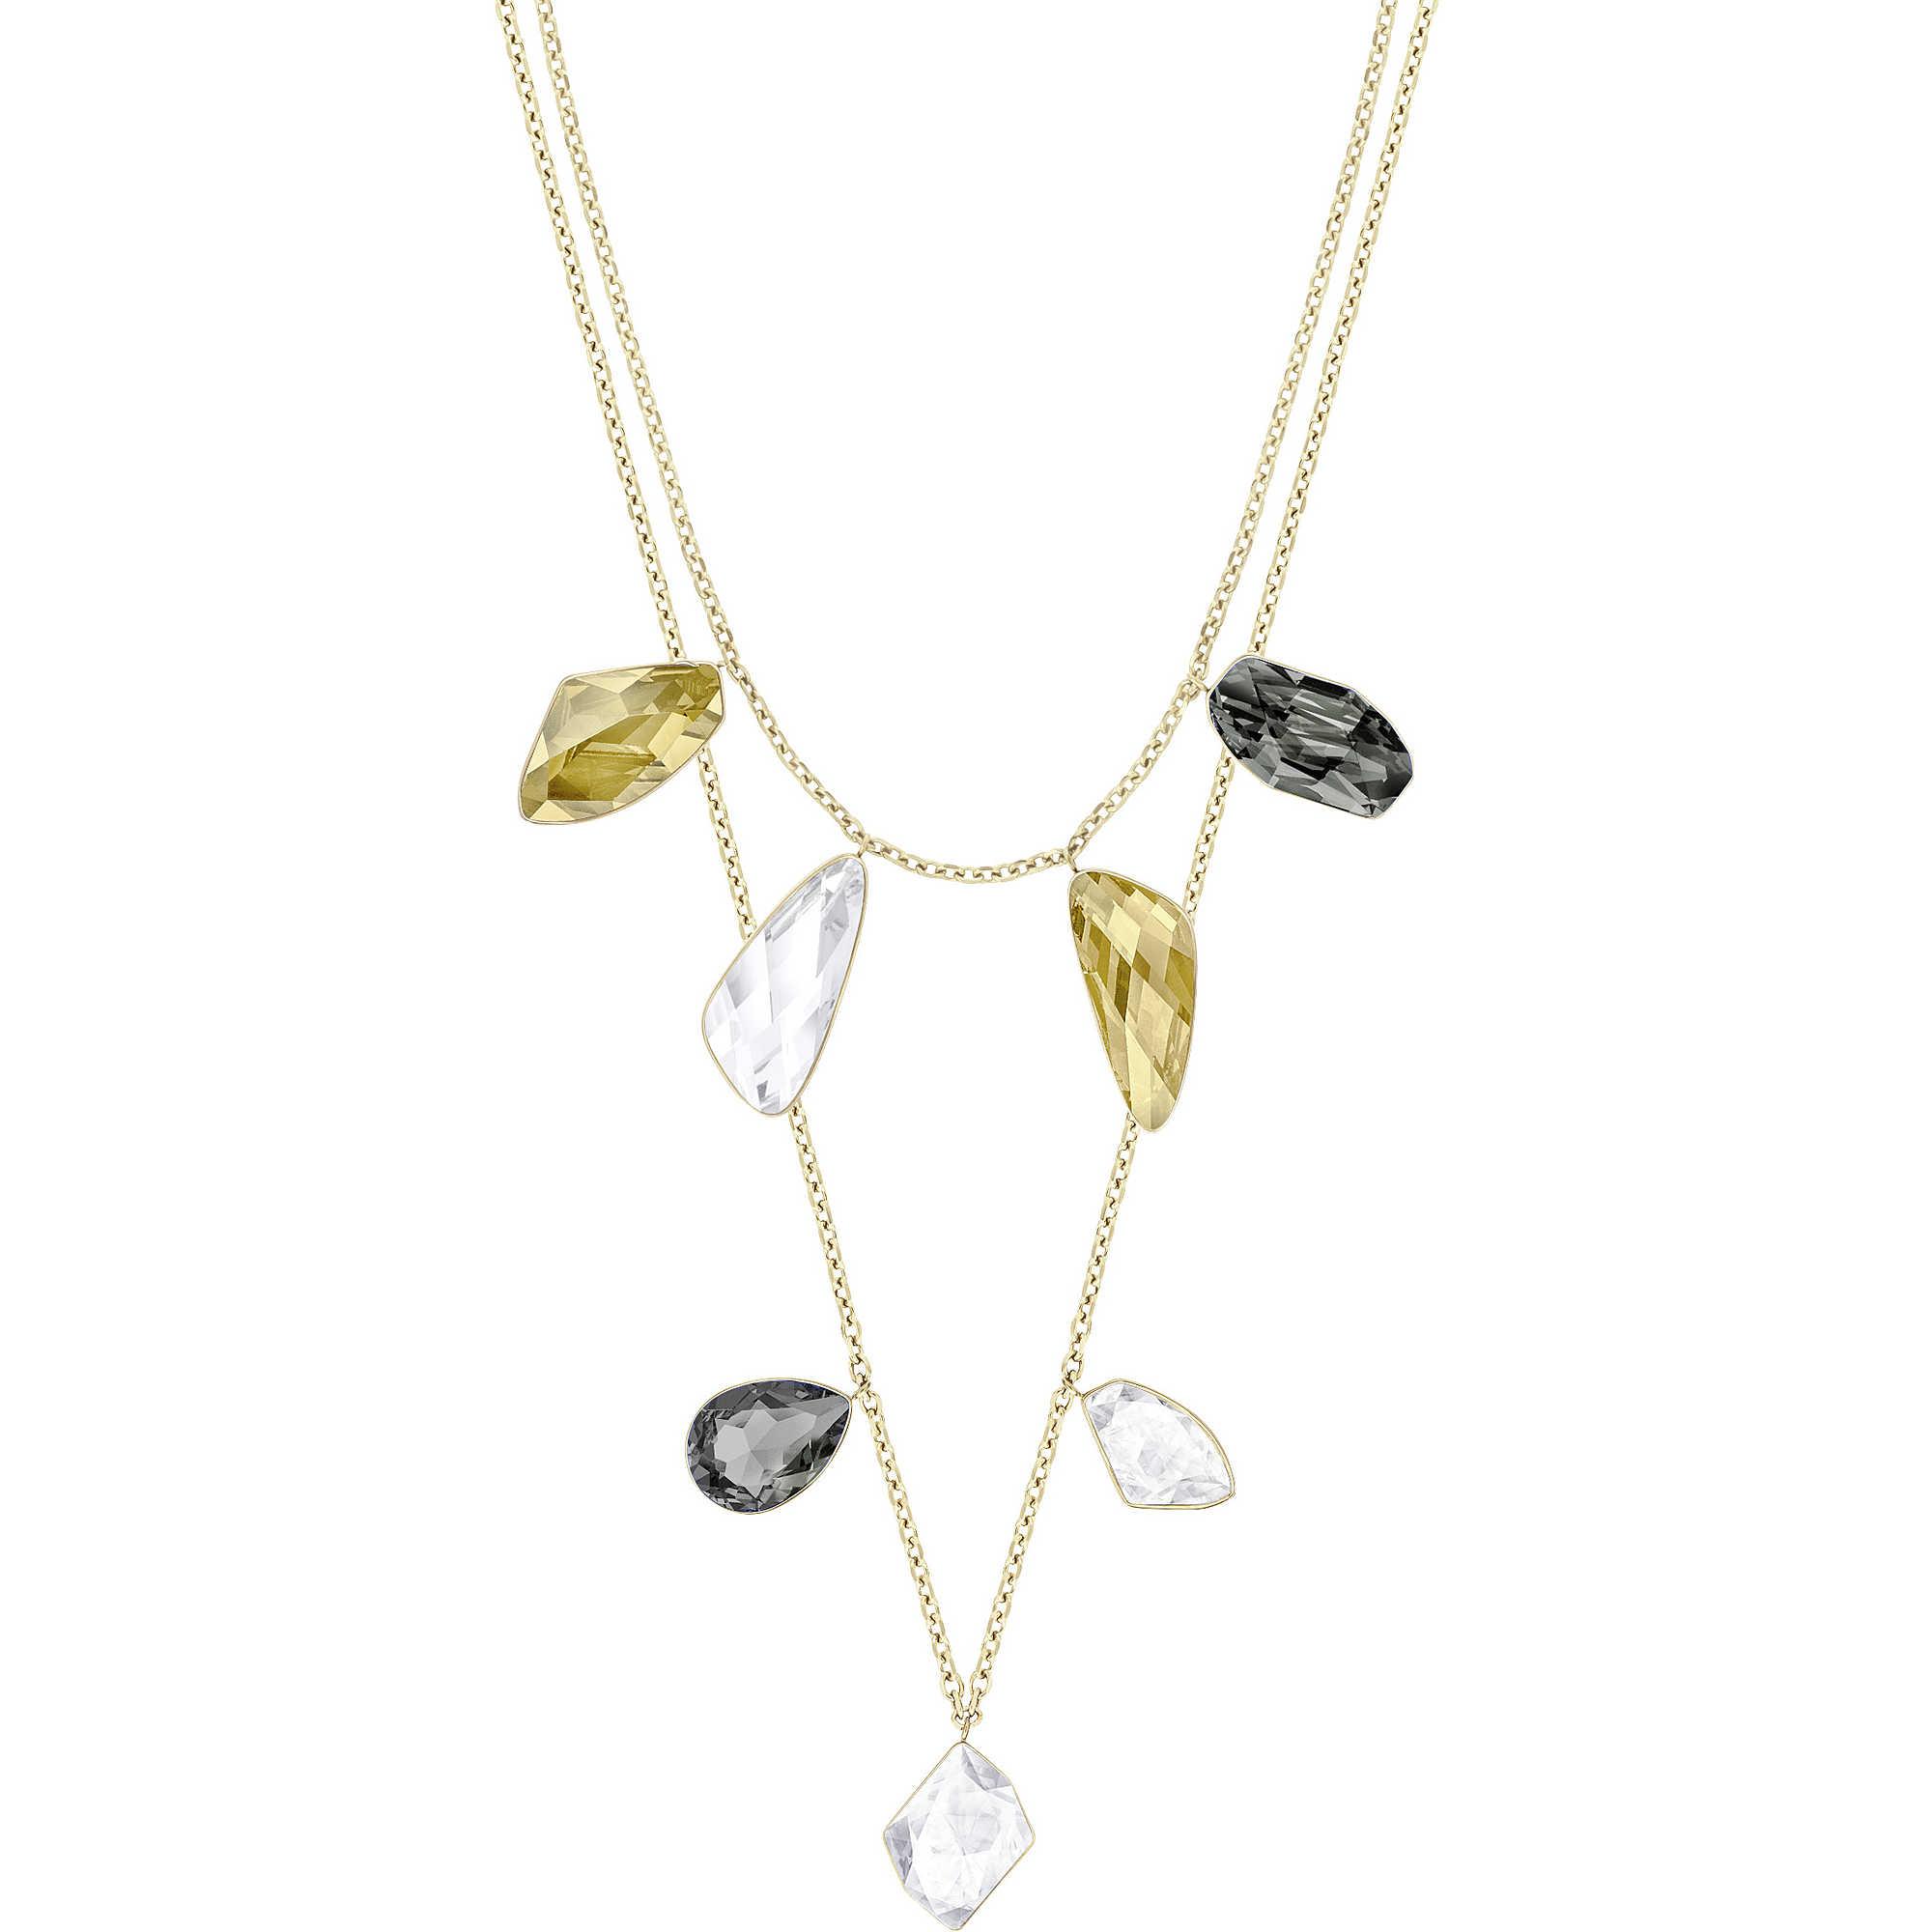 necklace with stones en image plated and pilgrim crystals precious brass ferrari quartz gold